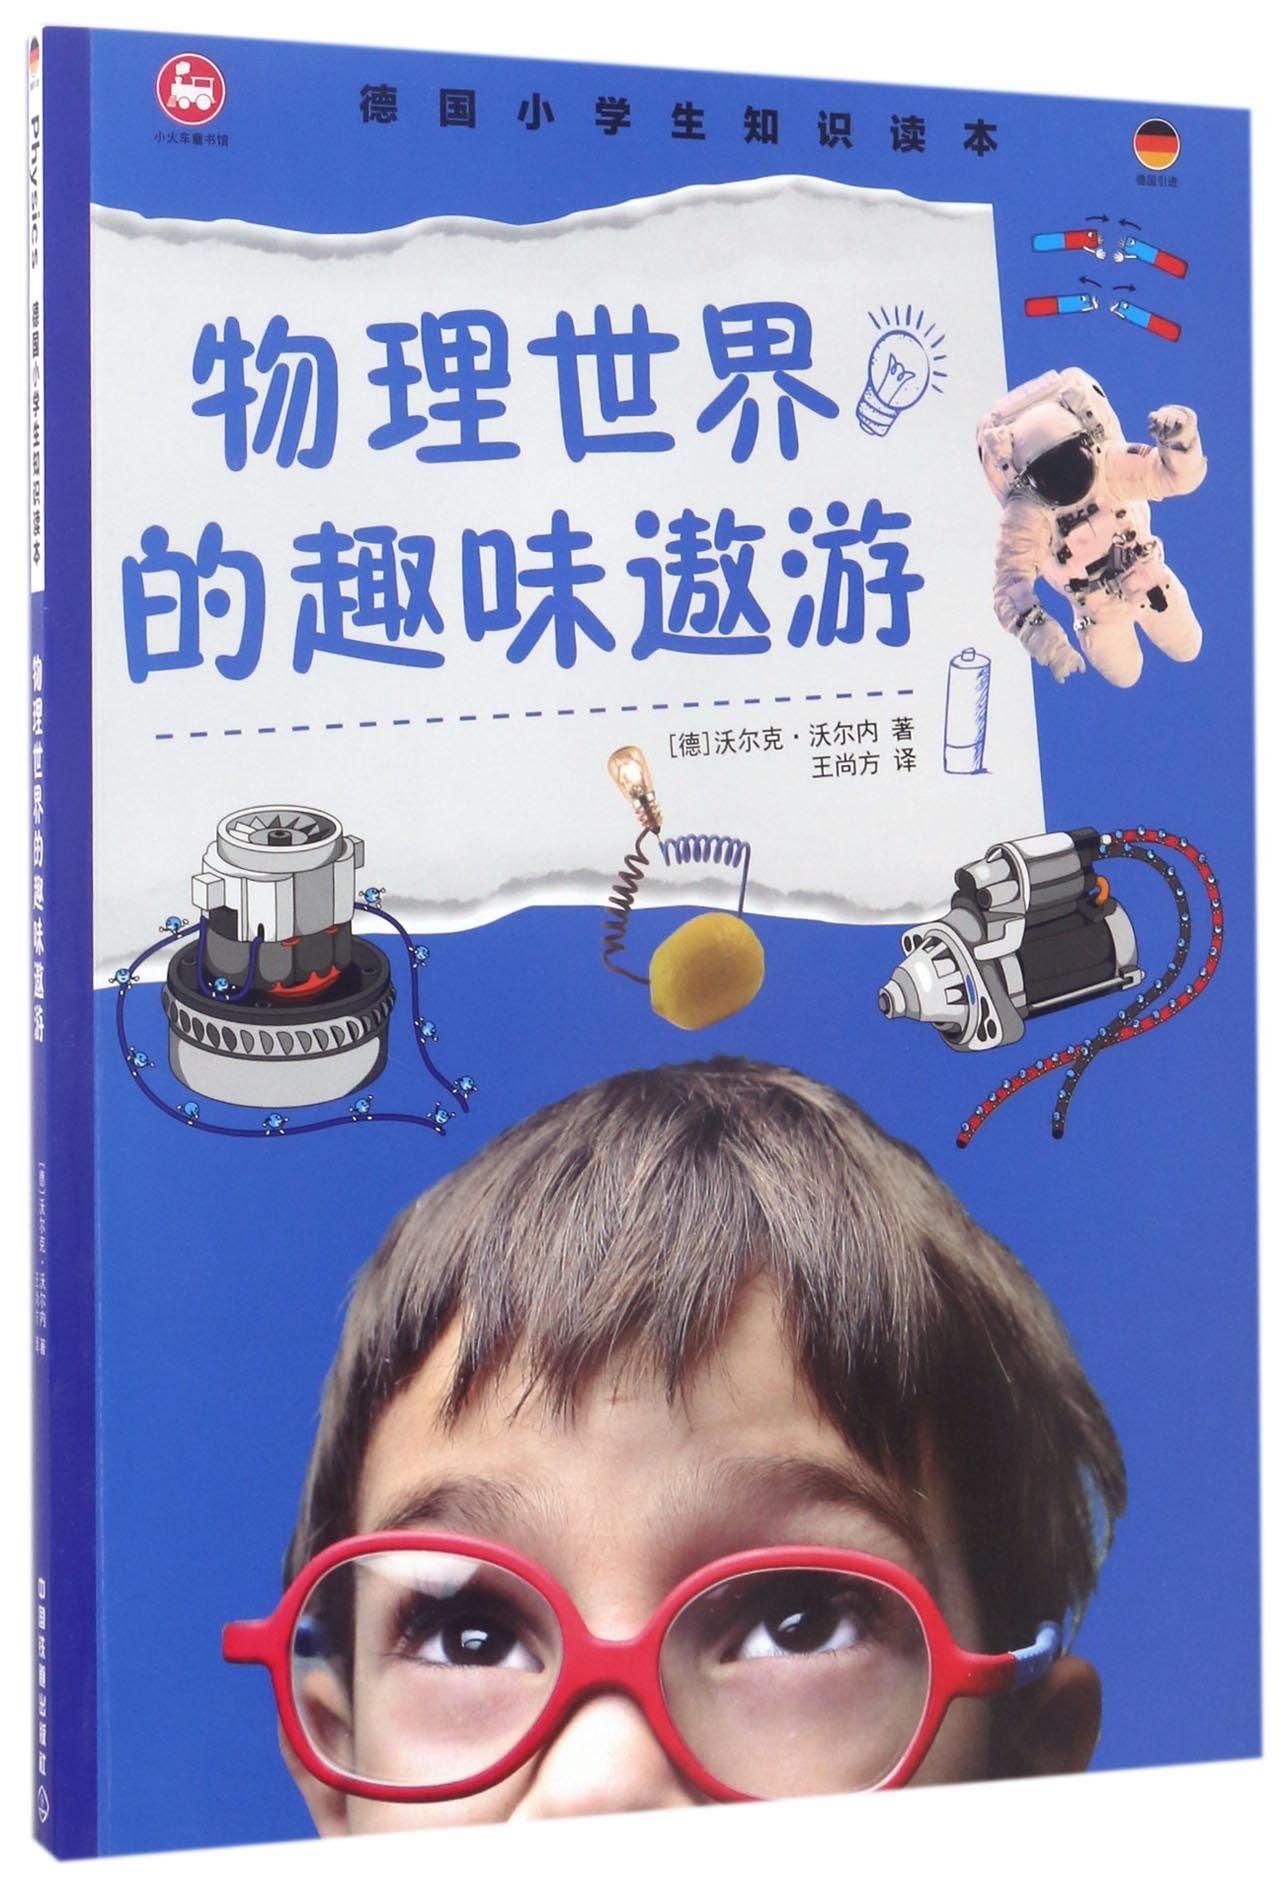 Physics (Chinese Edition) pdf